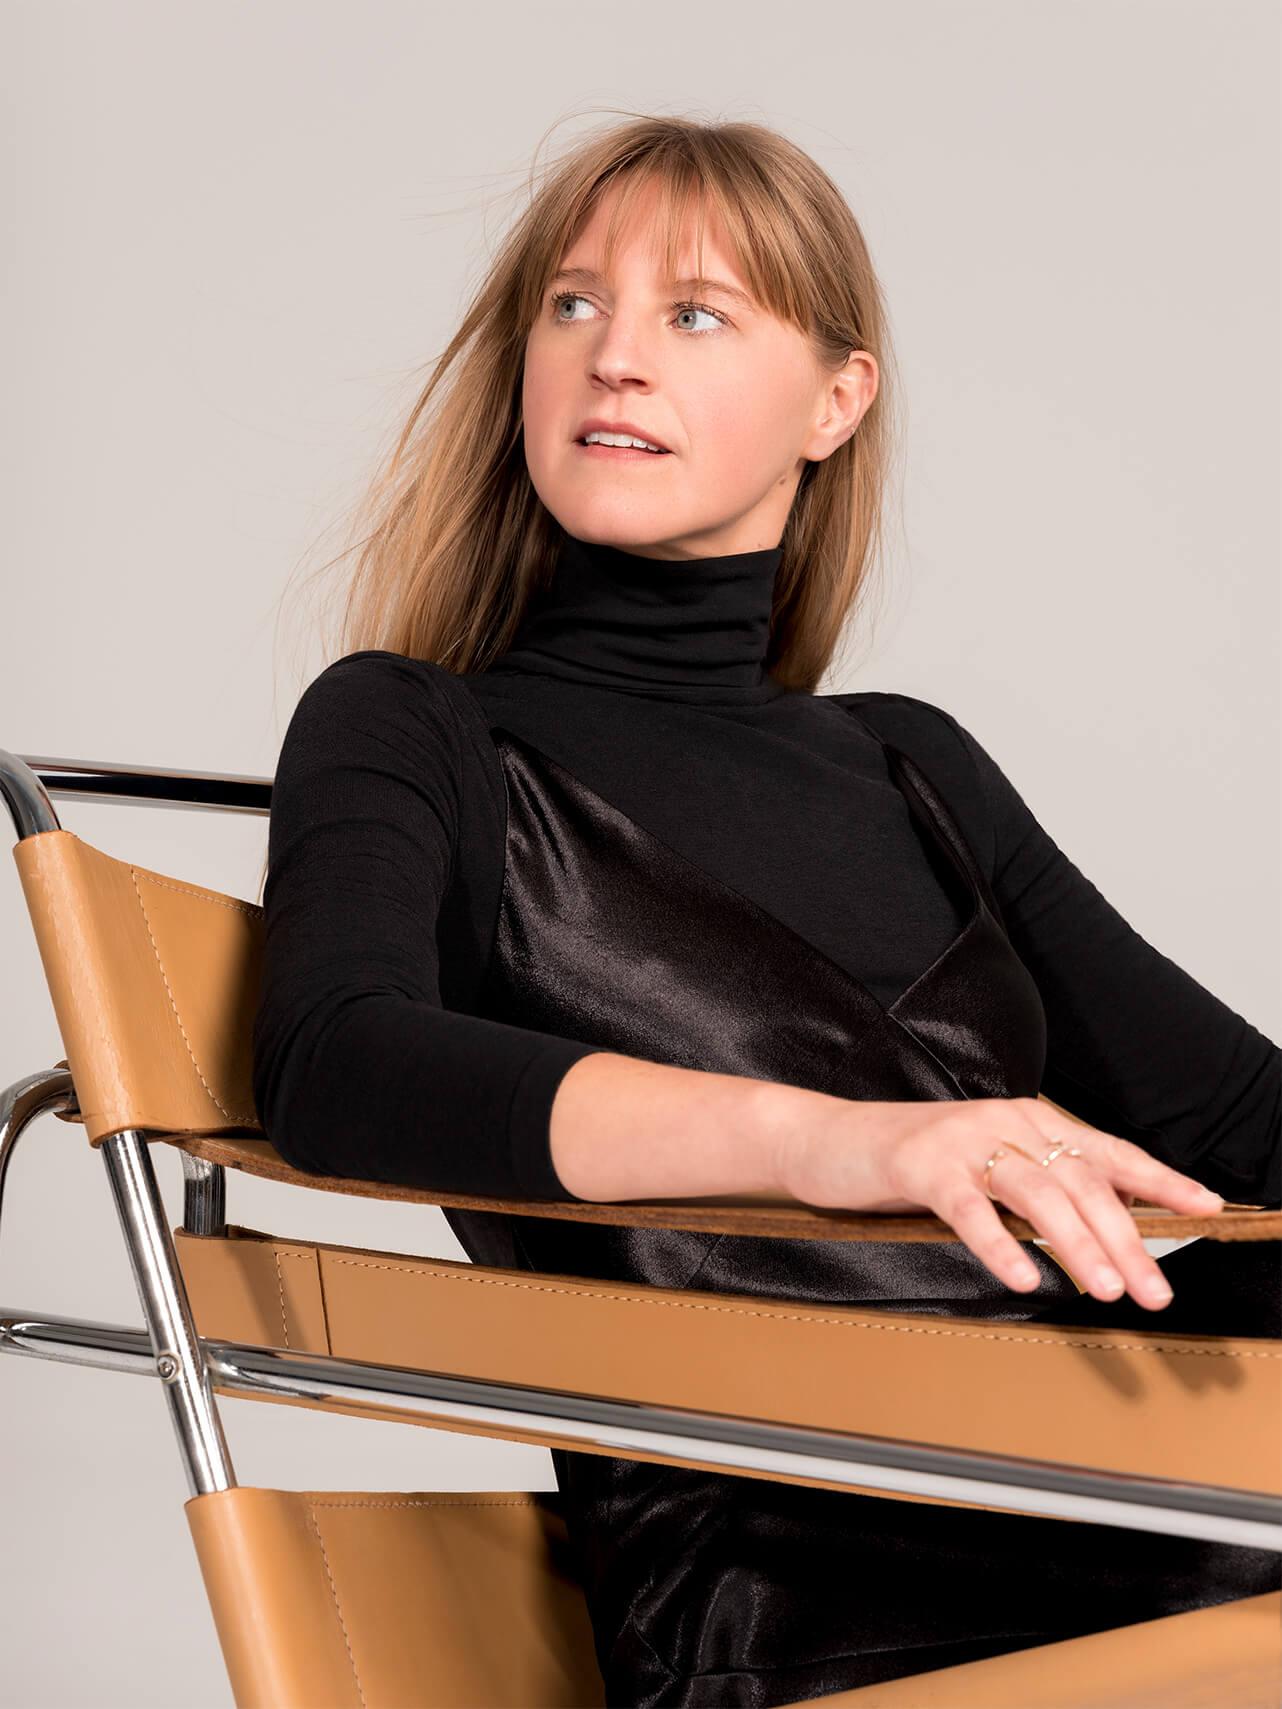 Parsons in BLACK bodysuit and black vince dress